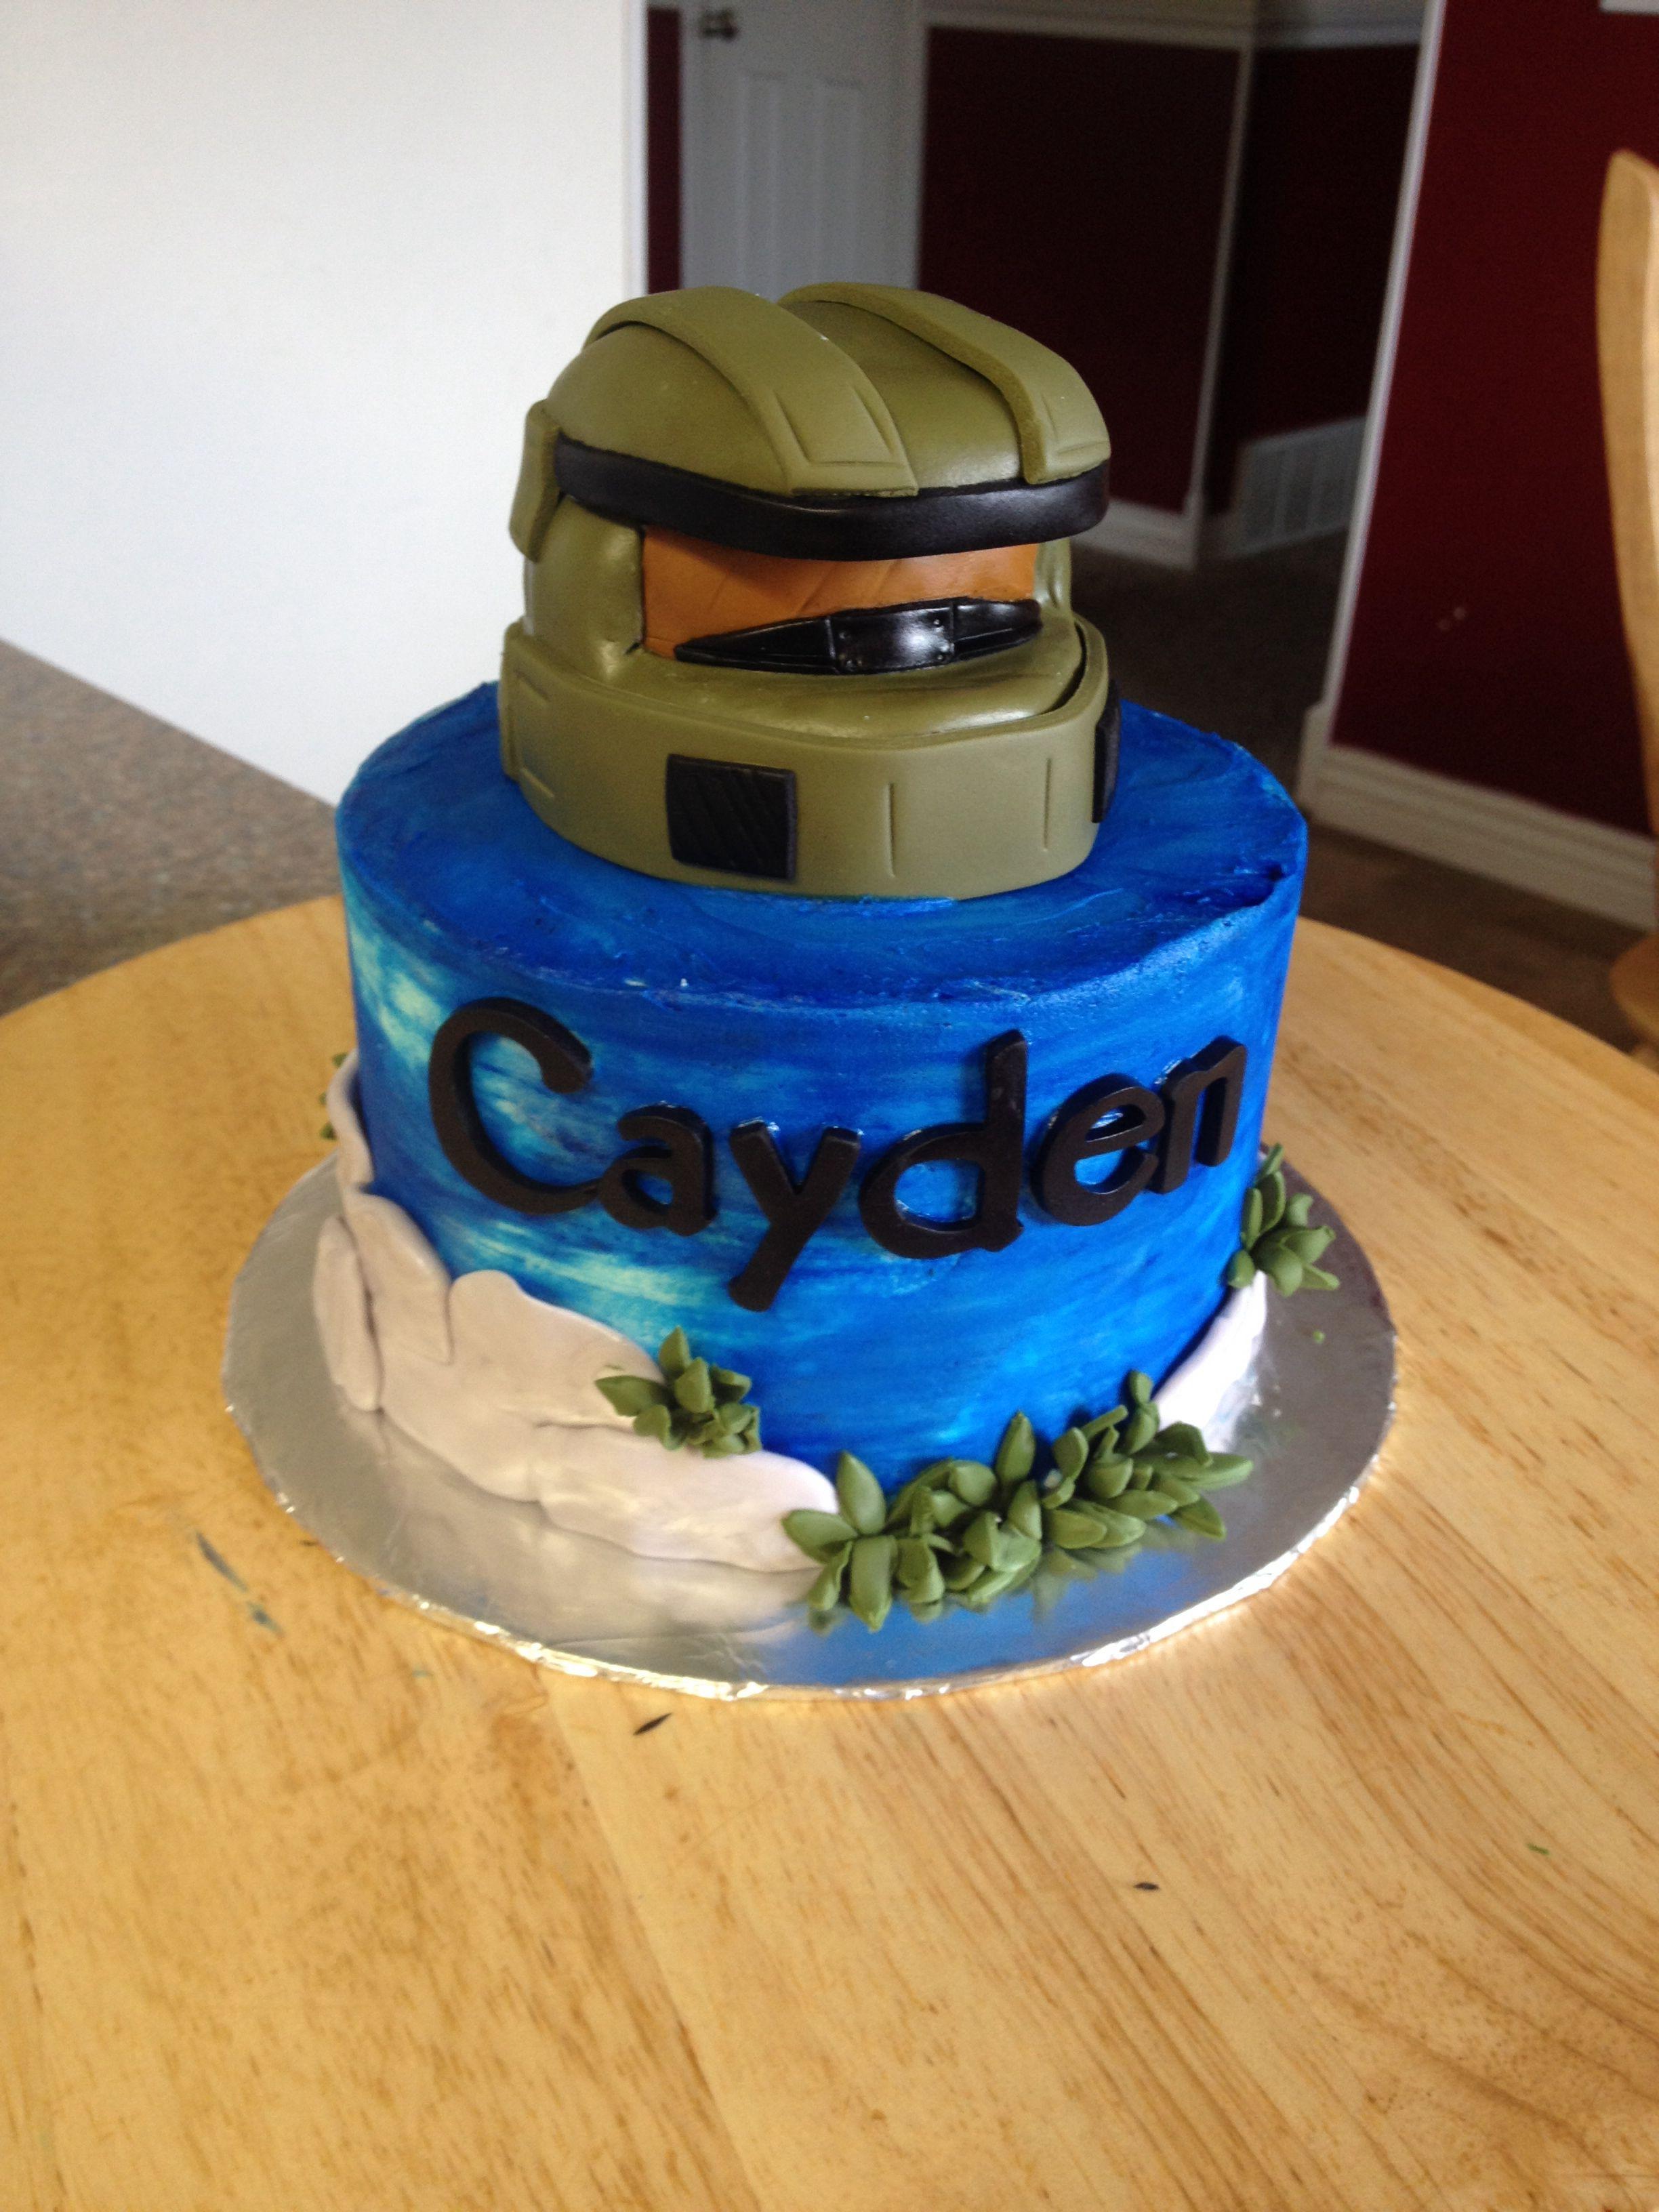 Halo cake cool cake designs my birthday cake halo cake